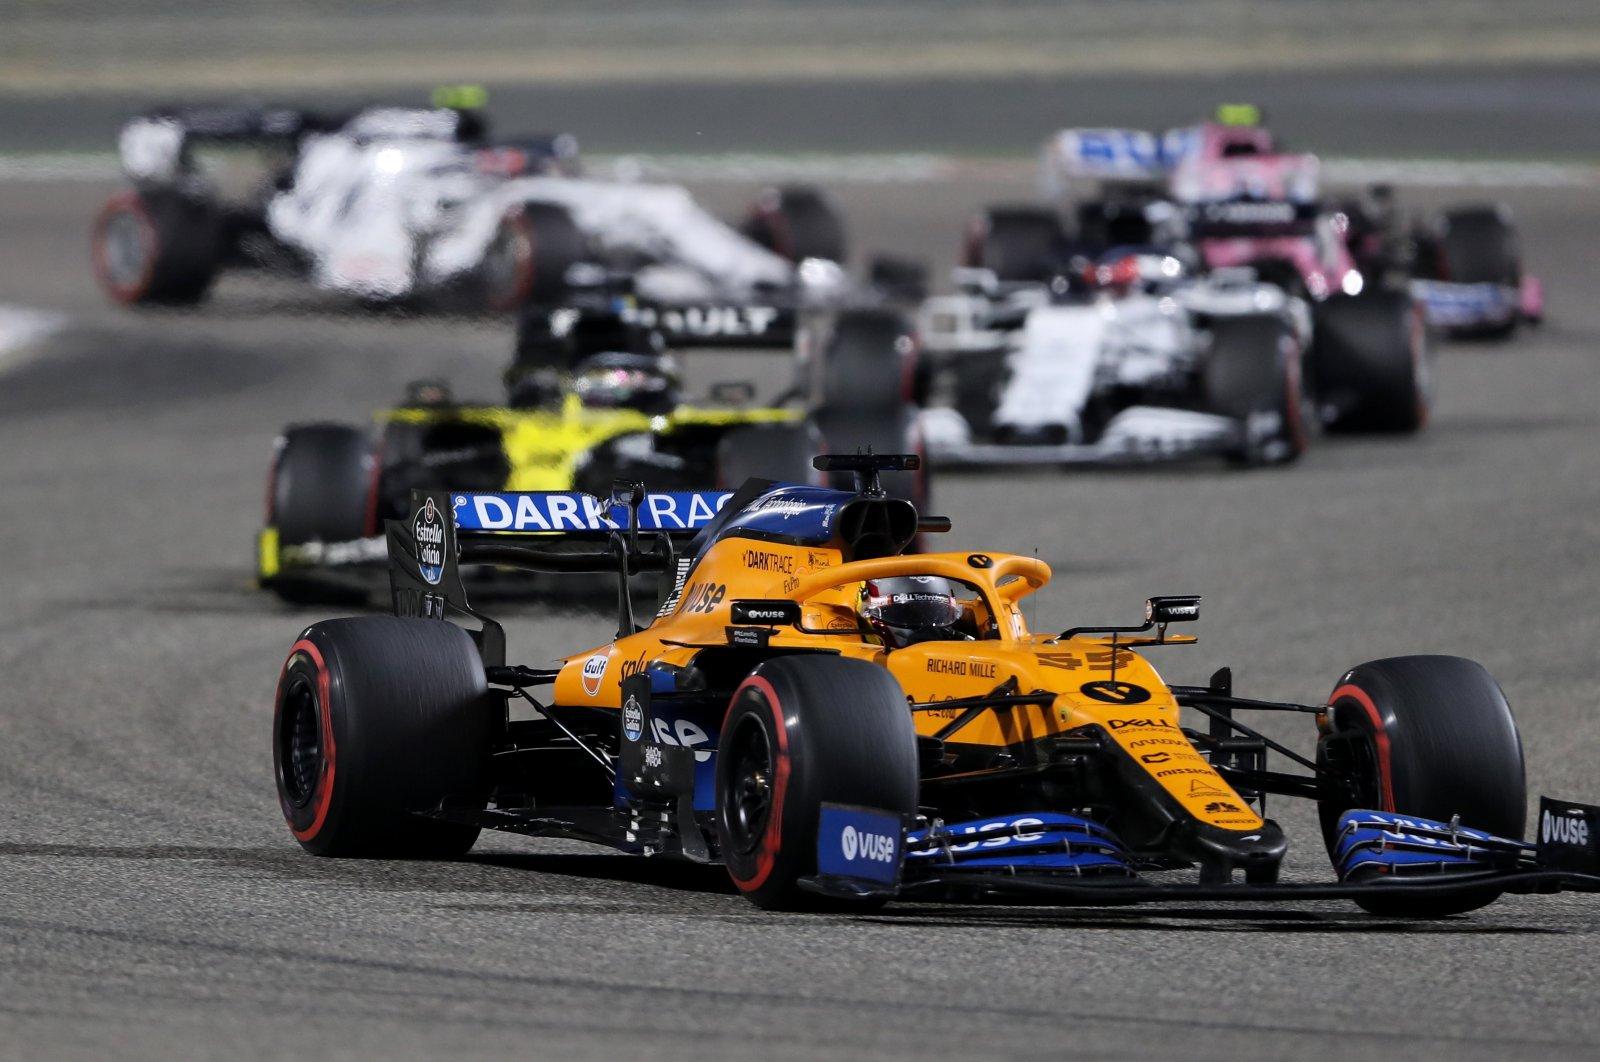 McLaren's Carlos Sainz Jr. in action during the race, Bahrain International Circuit, Sakhir, Bahrain, Dec. 6, 2020. (Reuters Photo)